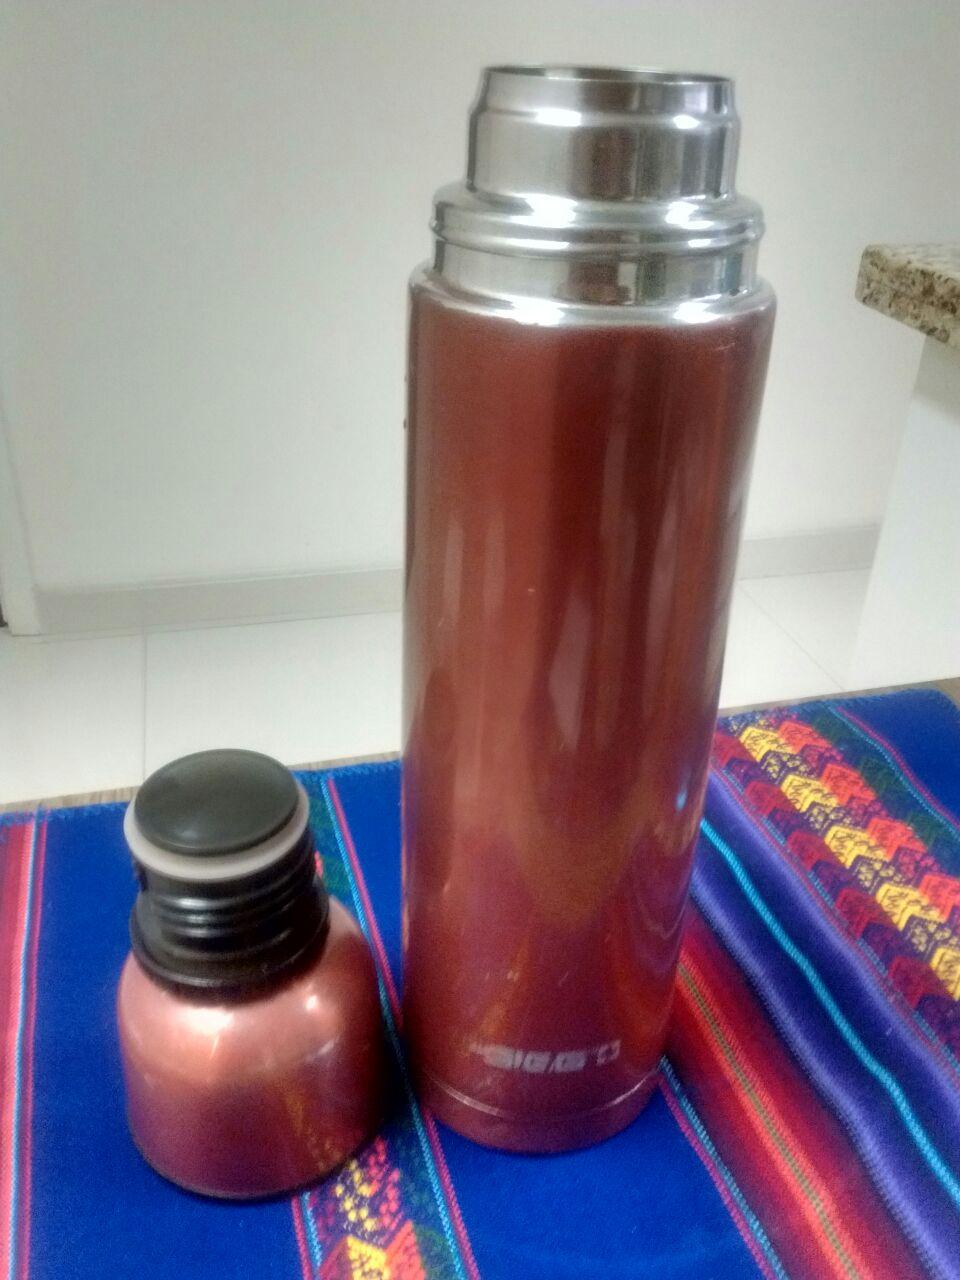 SIGG Thermal Bottle 1.0 Liter